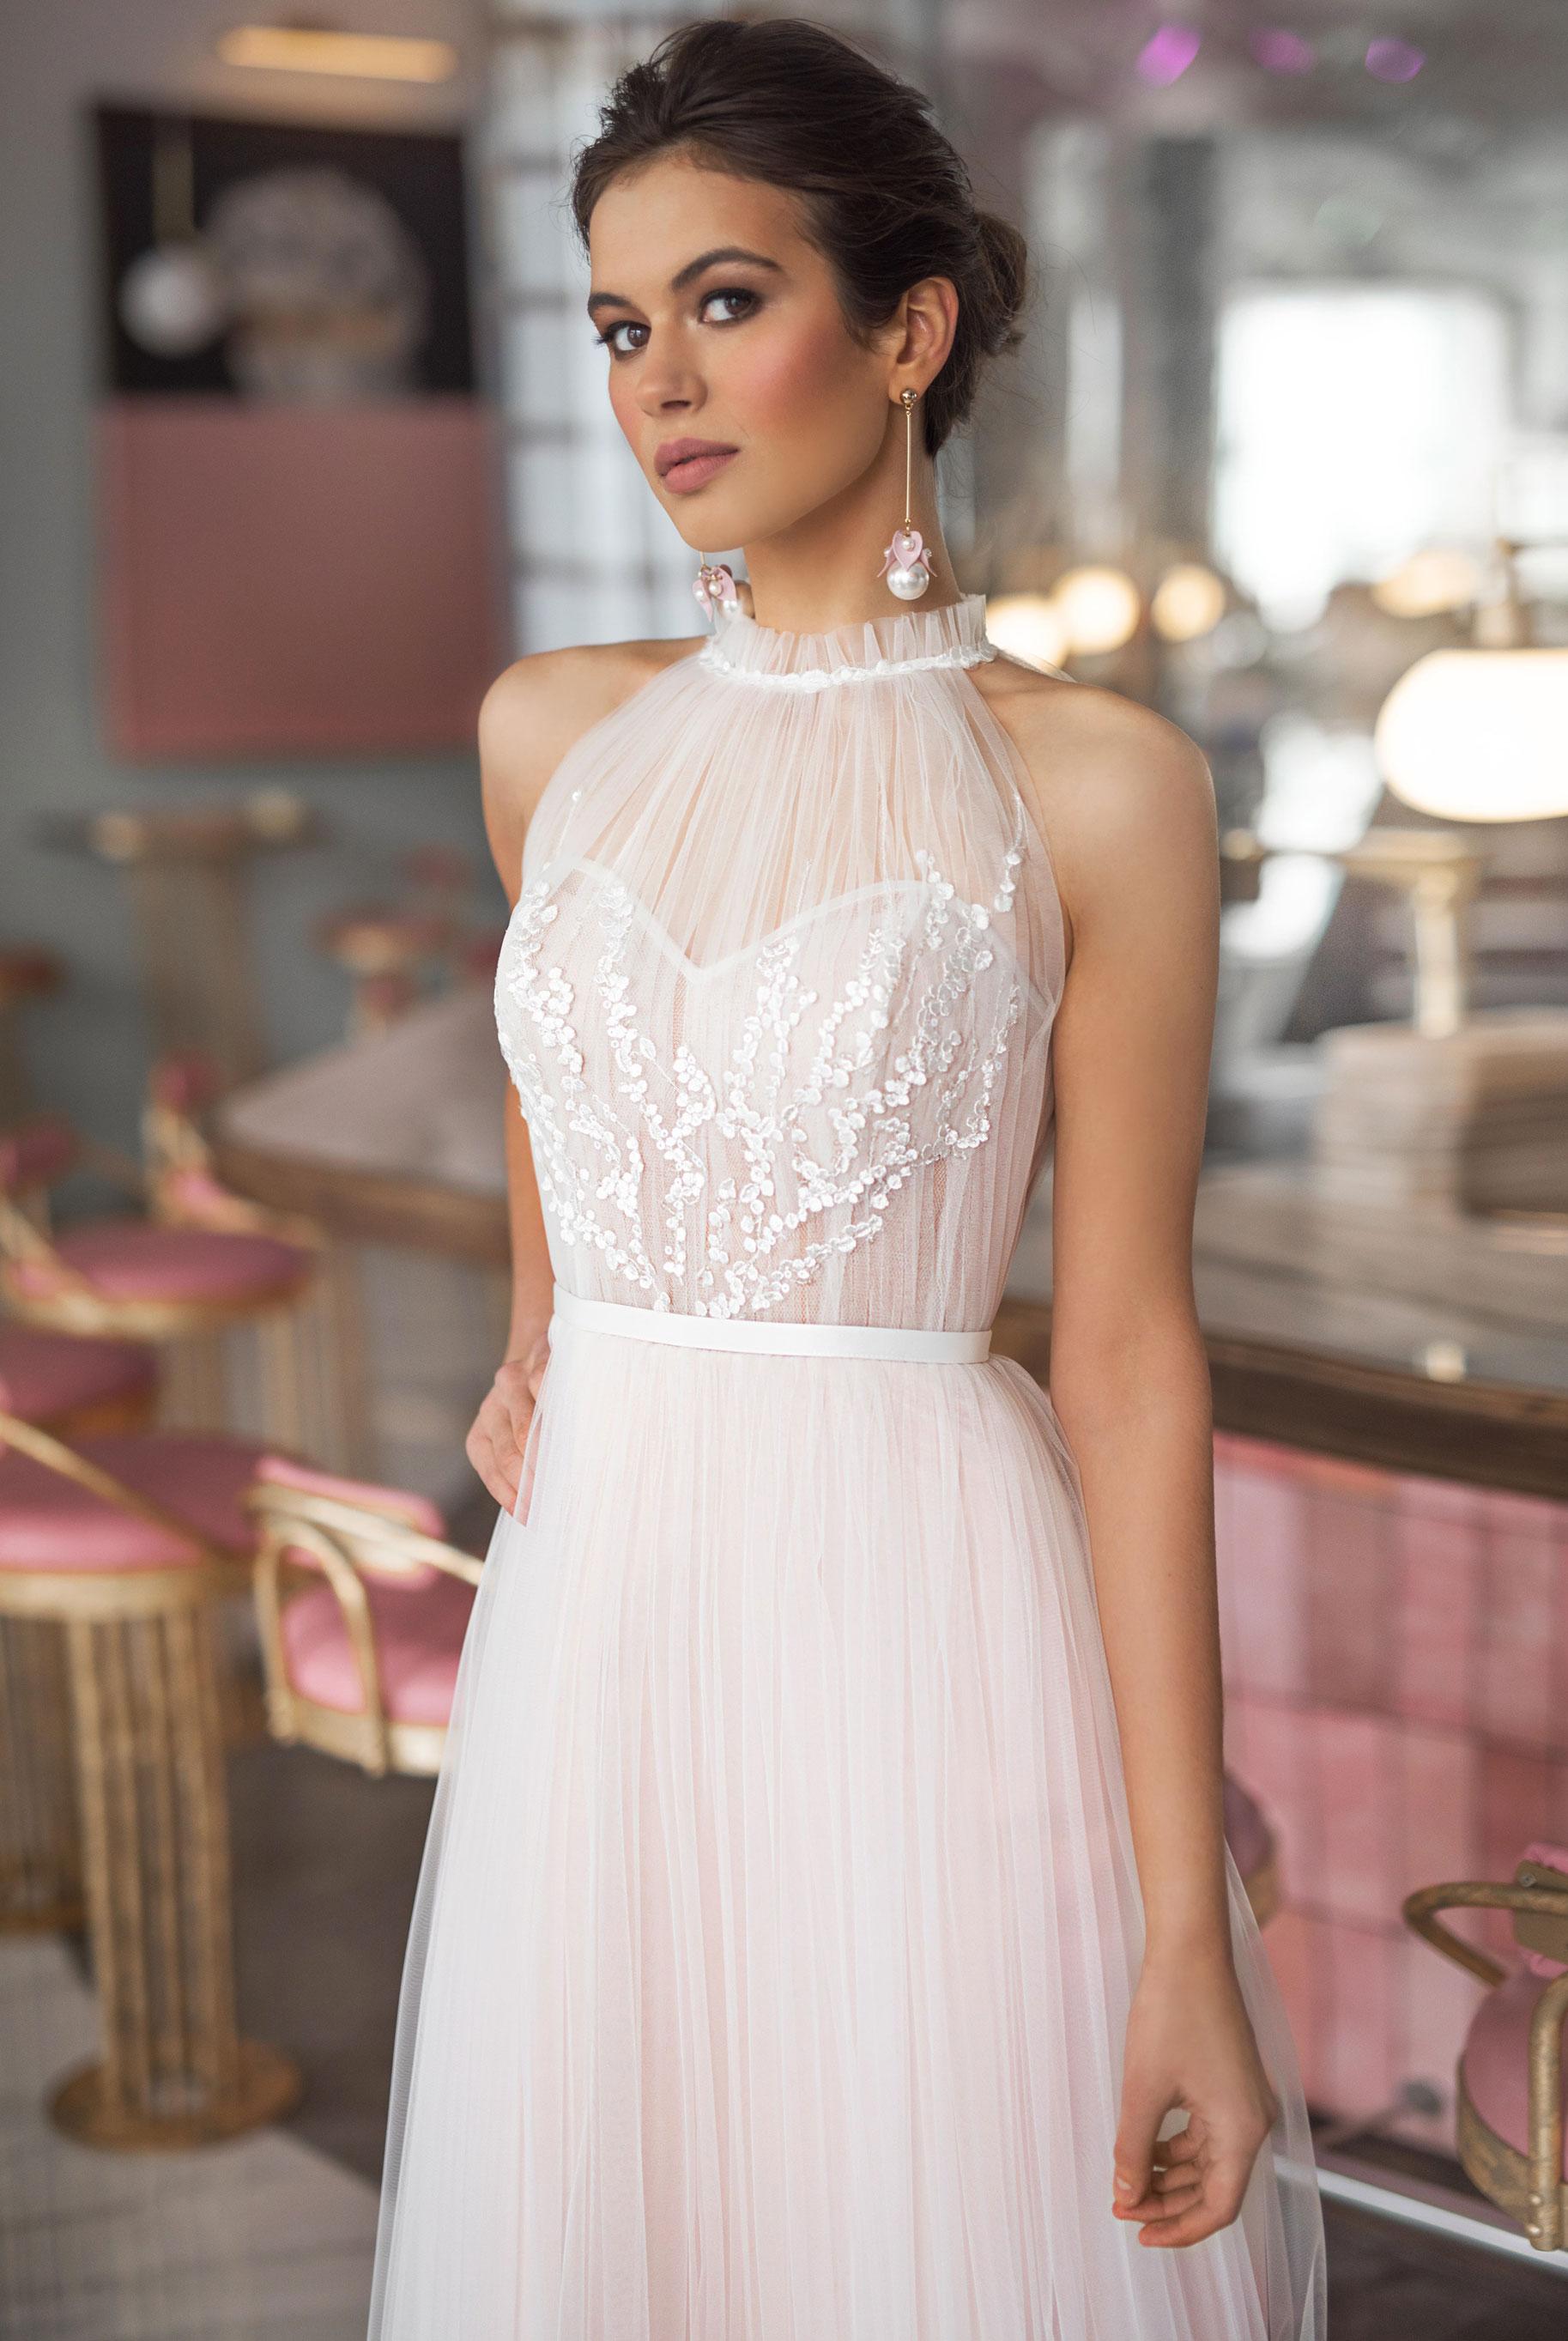 Ксения Саладуха в свадебных нарядах Ave Wedding, весна-лето 2019 / фото 02